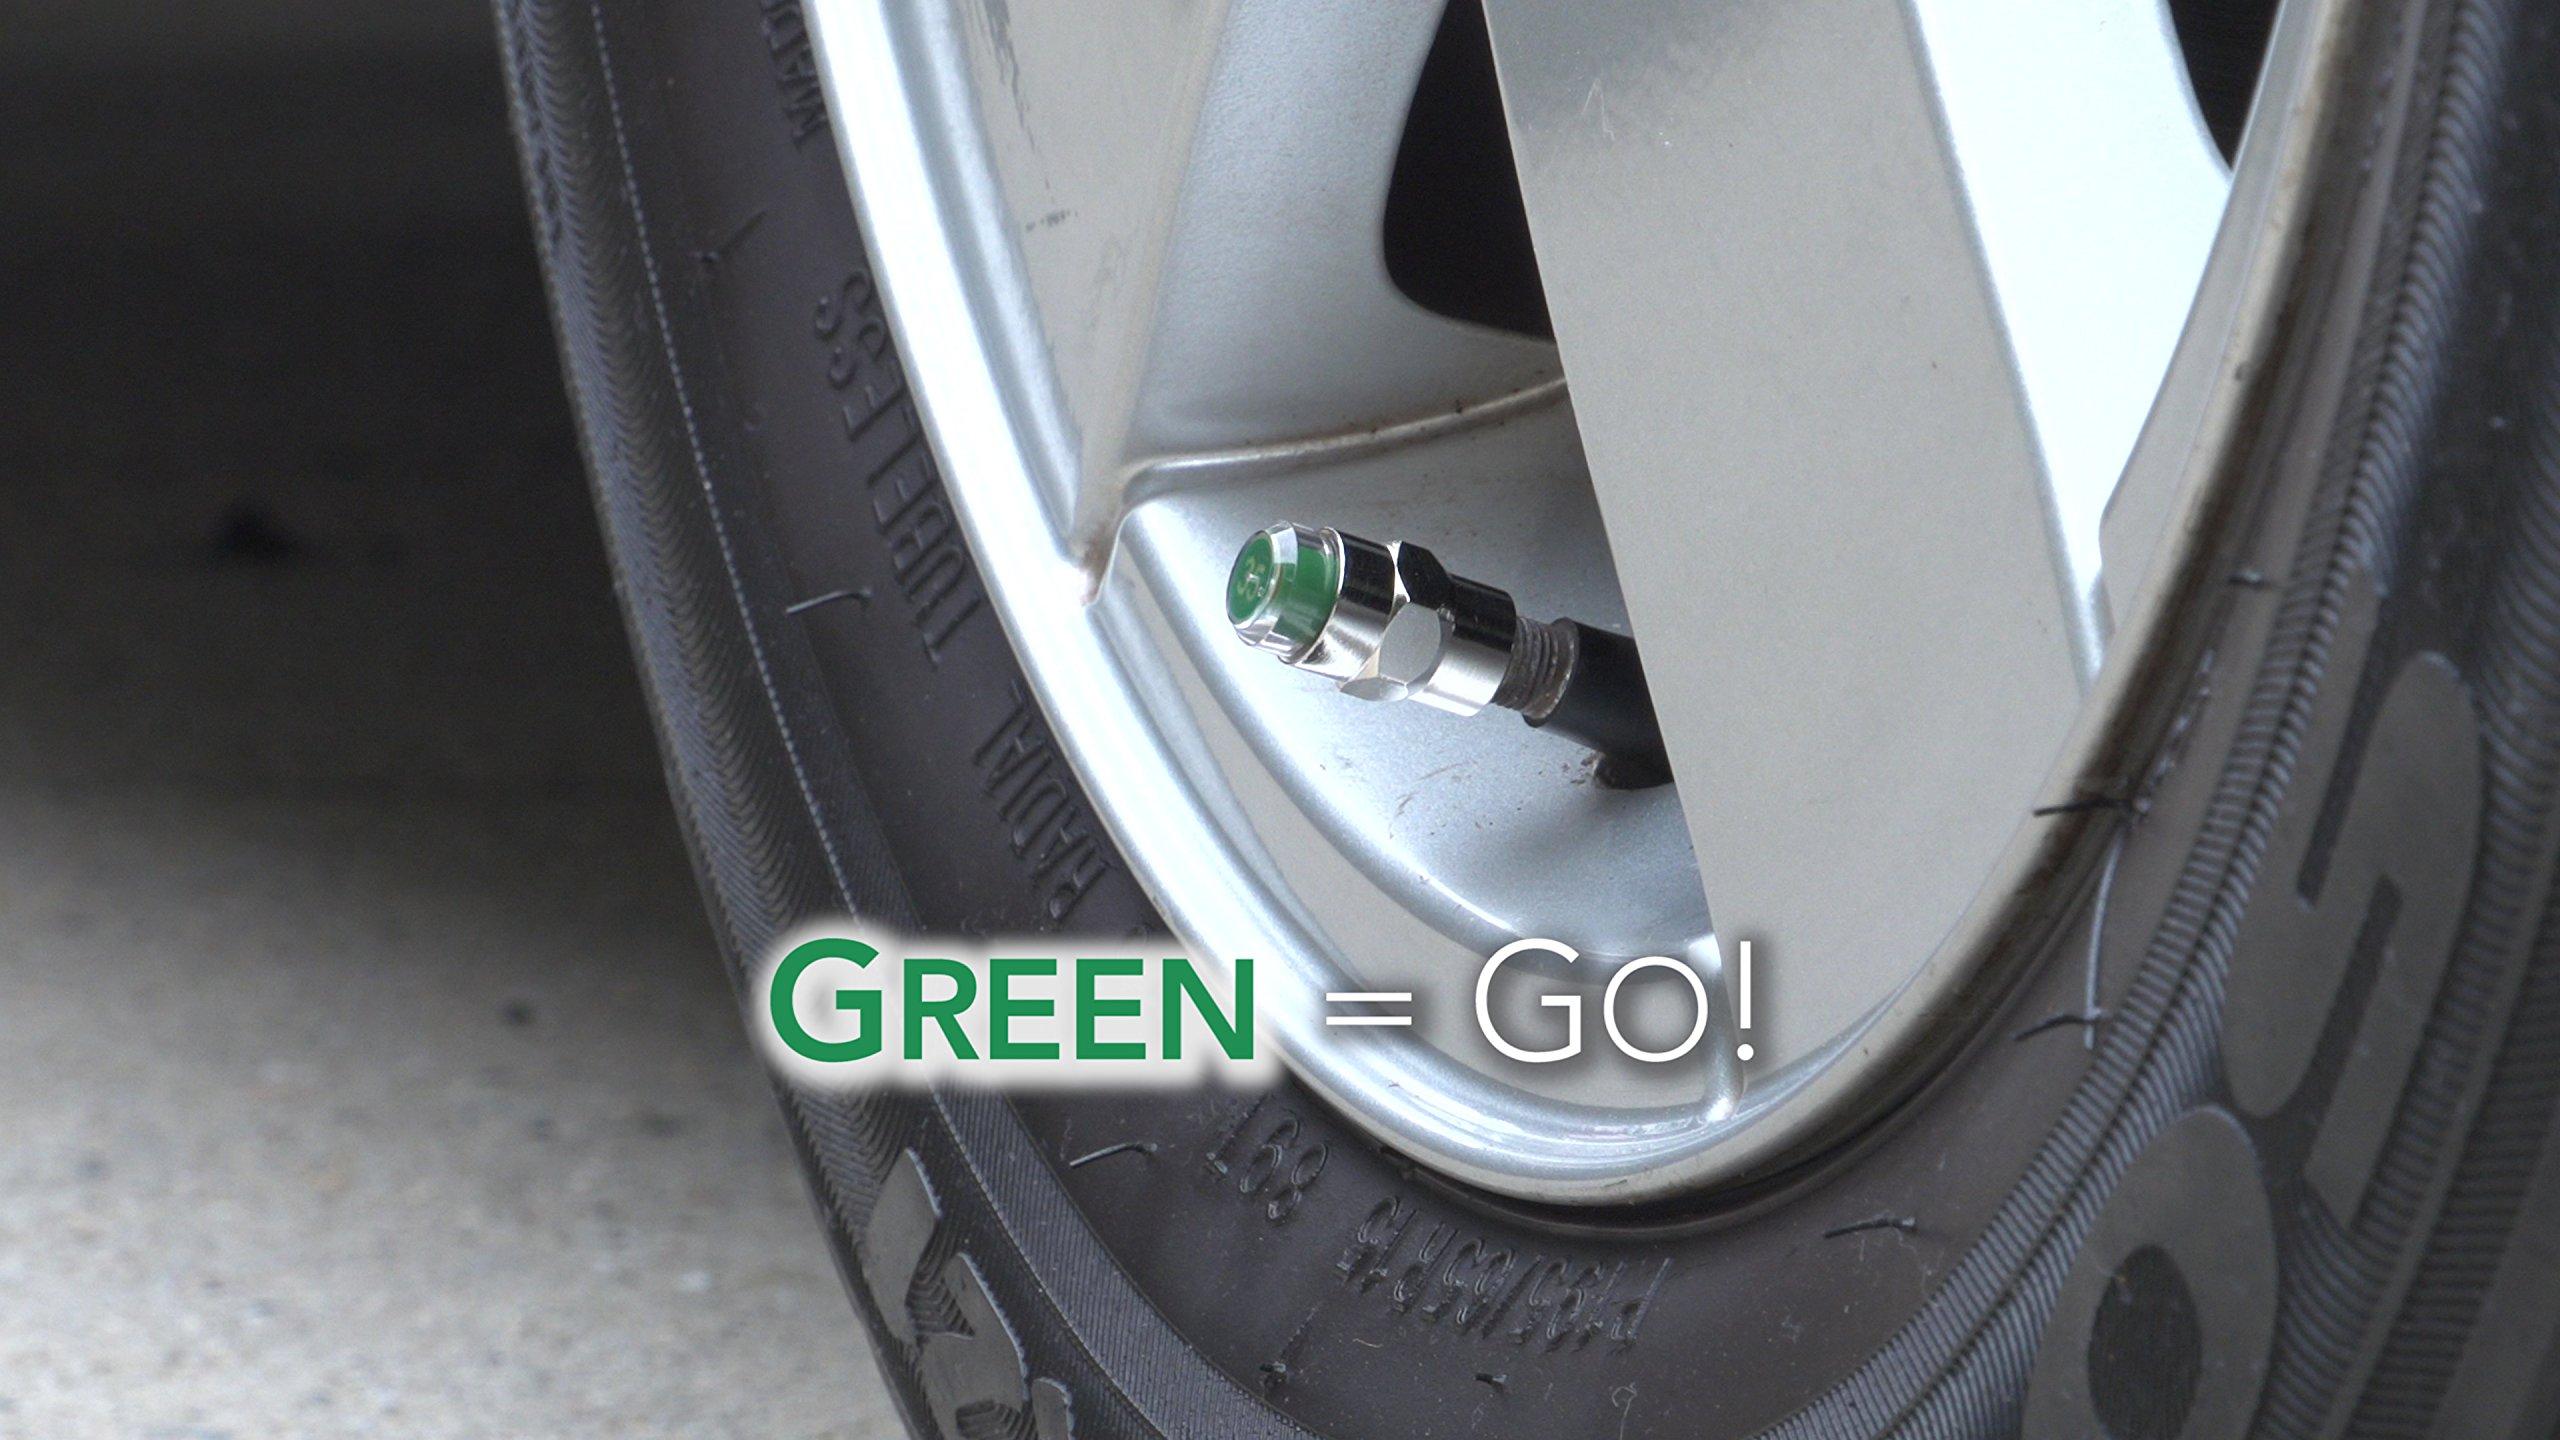 CLC International EZ Read Tire Caps - Valve Stem Caps that Monitor Tire Pressure - Tire Caps, All Season, Prevent Flats & Blow Outs - PSI 50 by CLC International (Image #3)